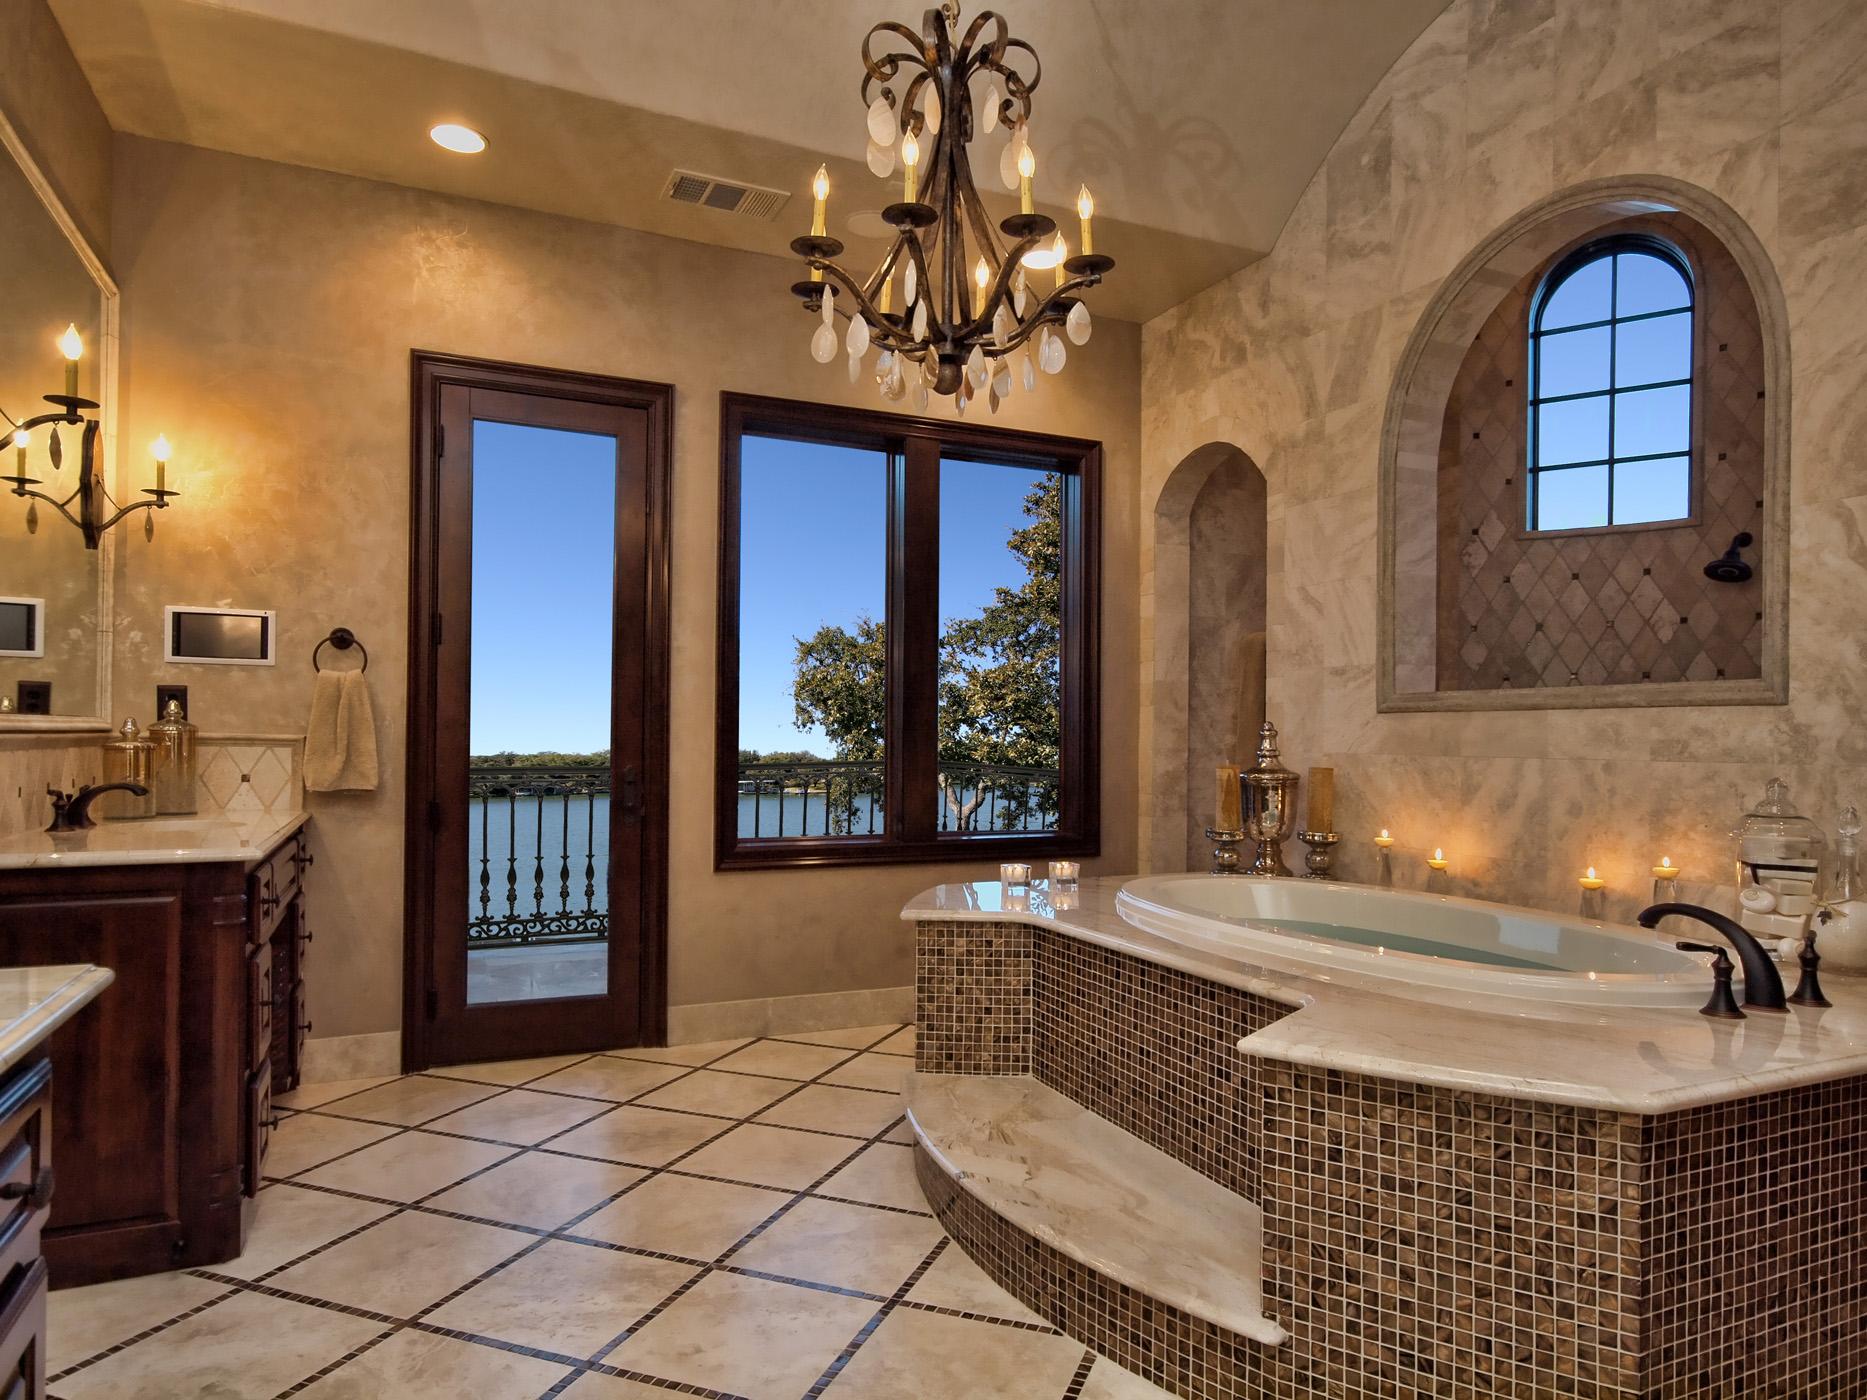 Bathroom Lighting And Mirrors Designs